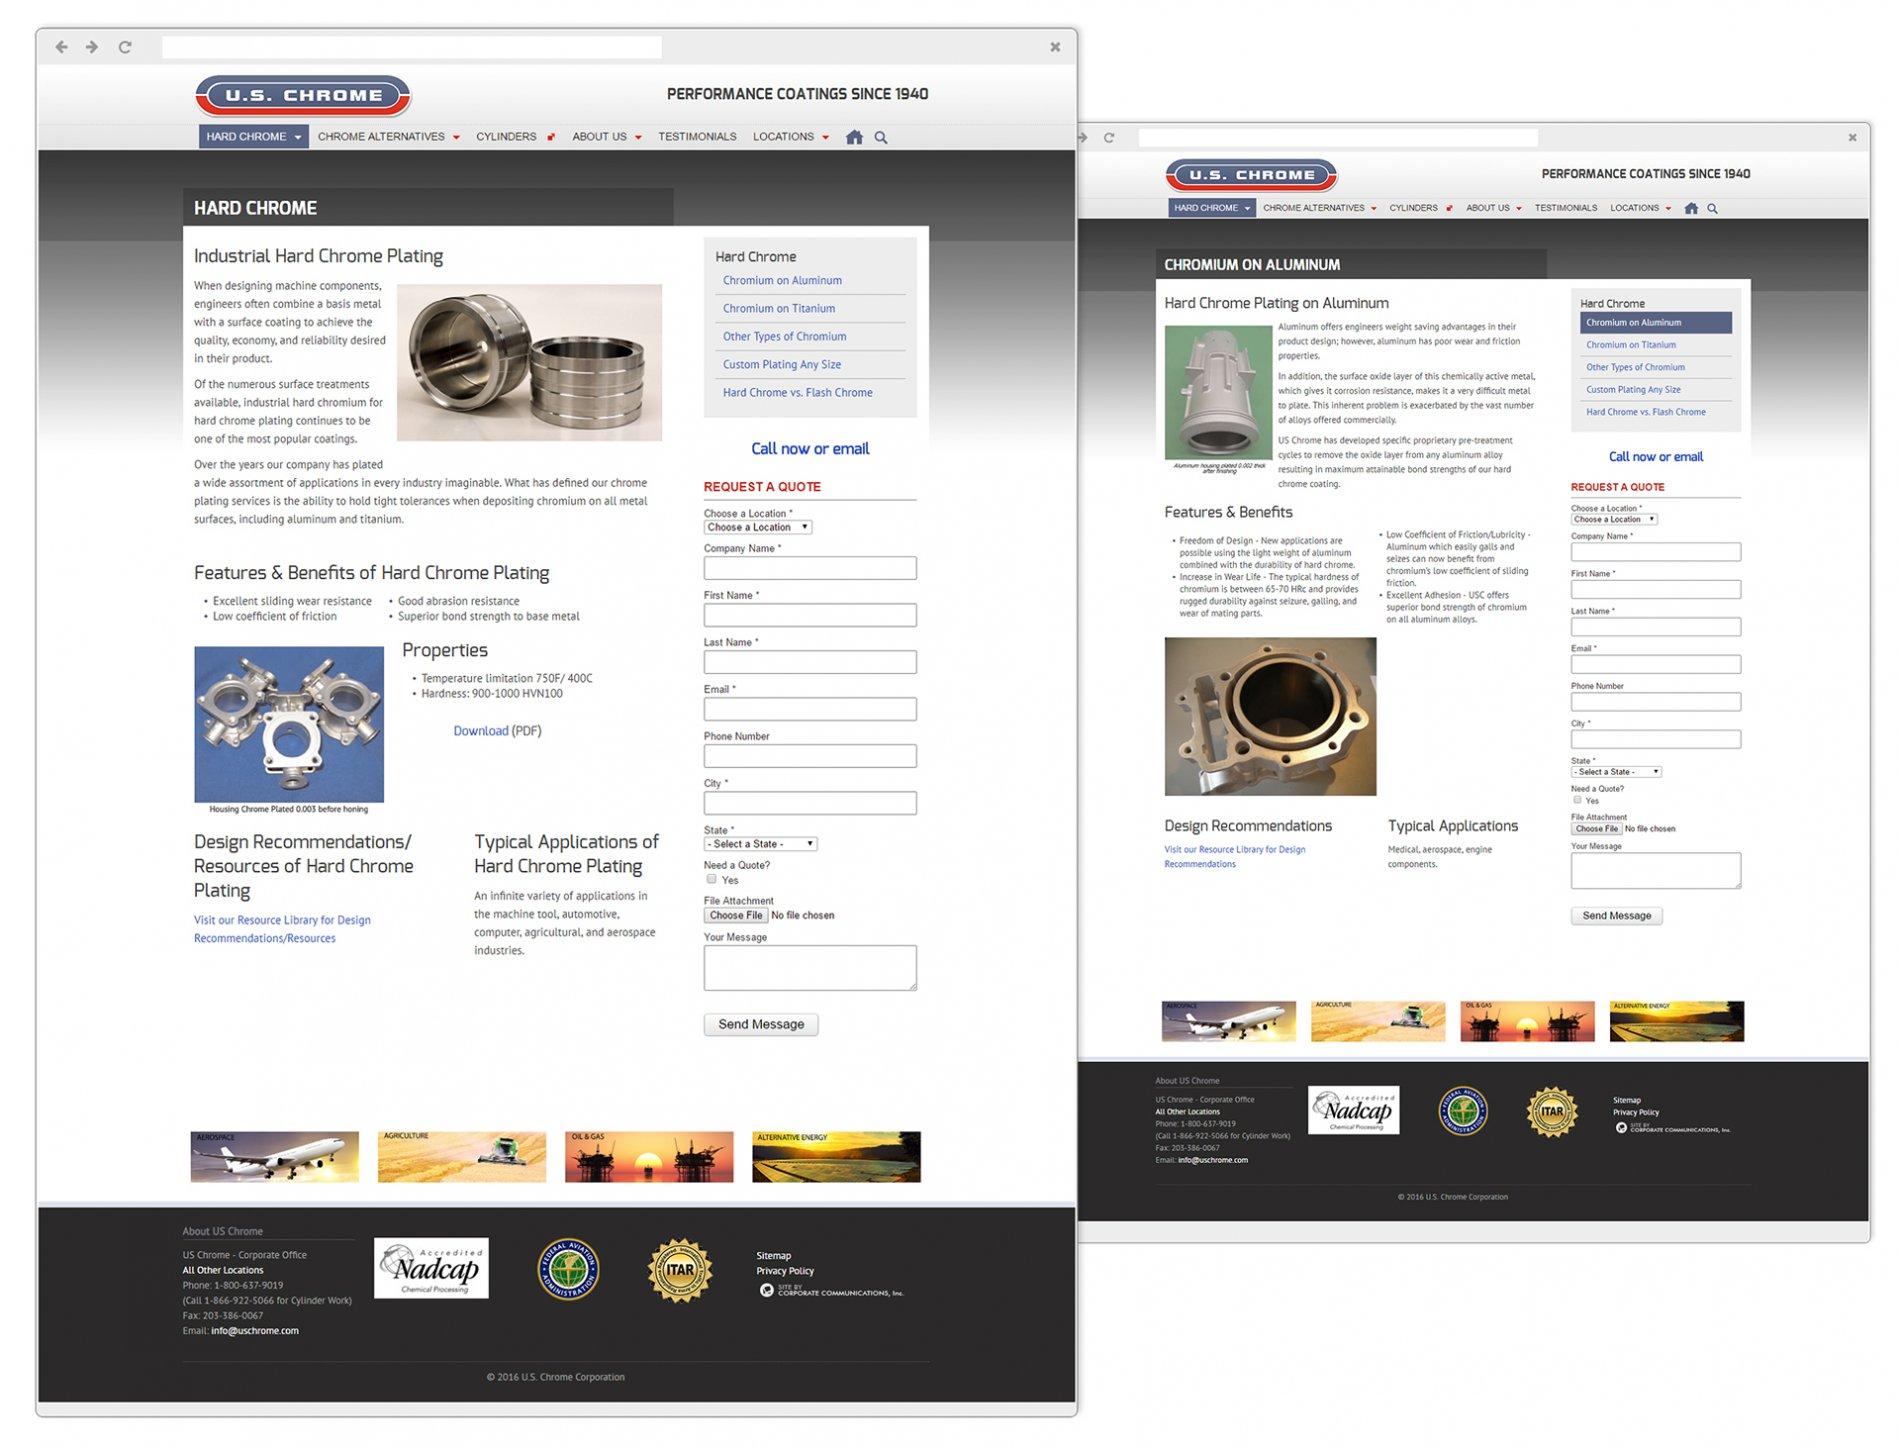 U.S. Chrome Sub Pages